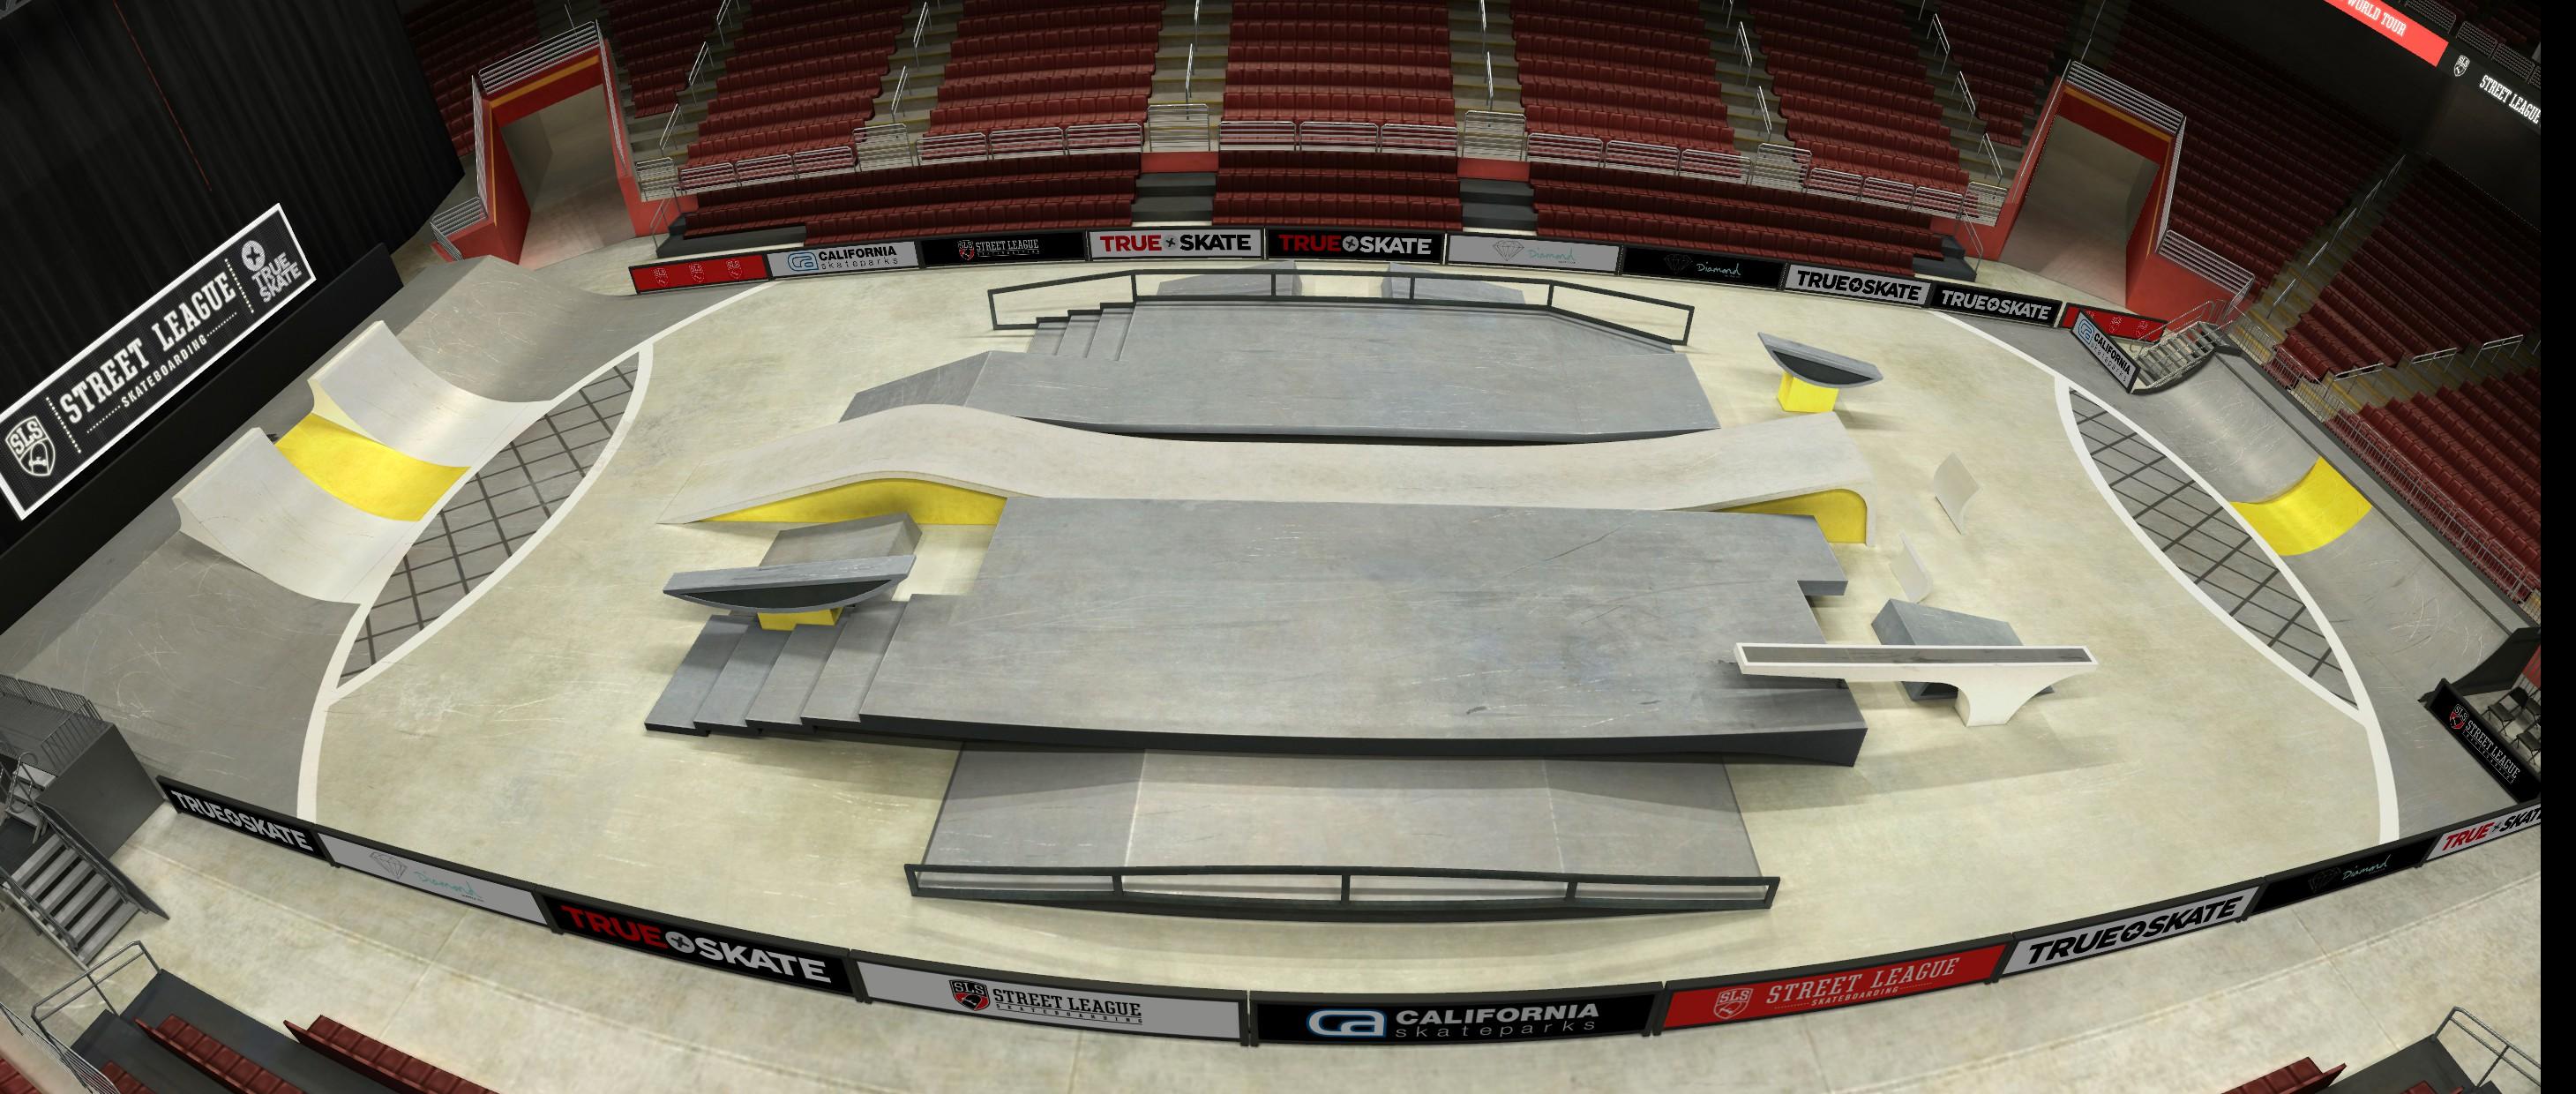 how to turn in true skate